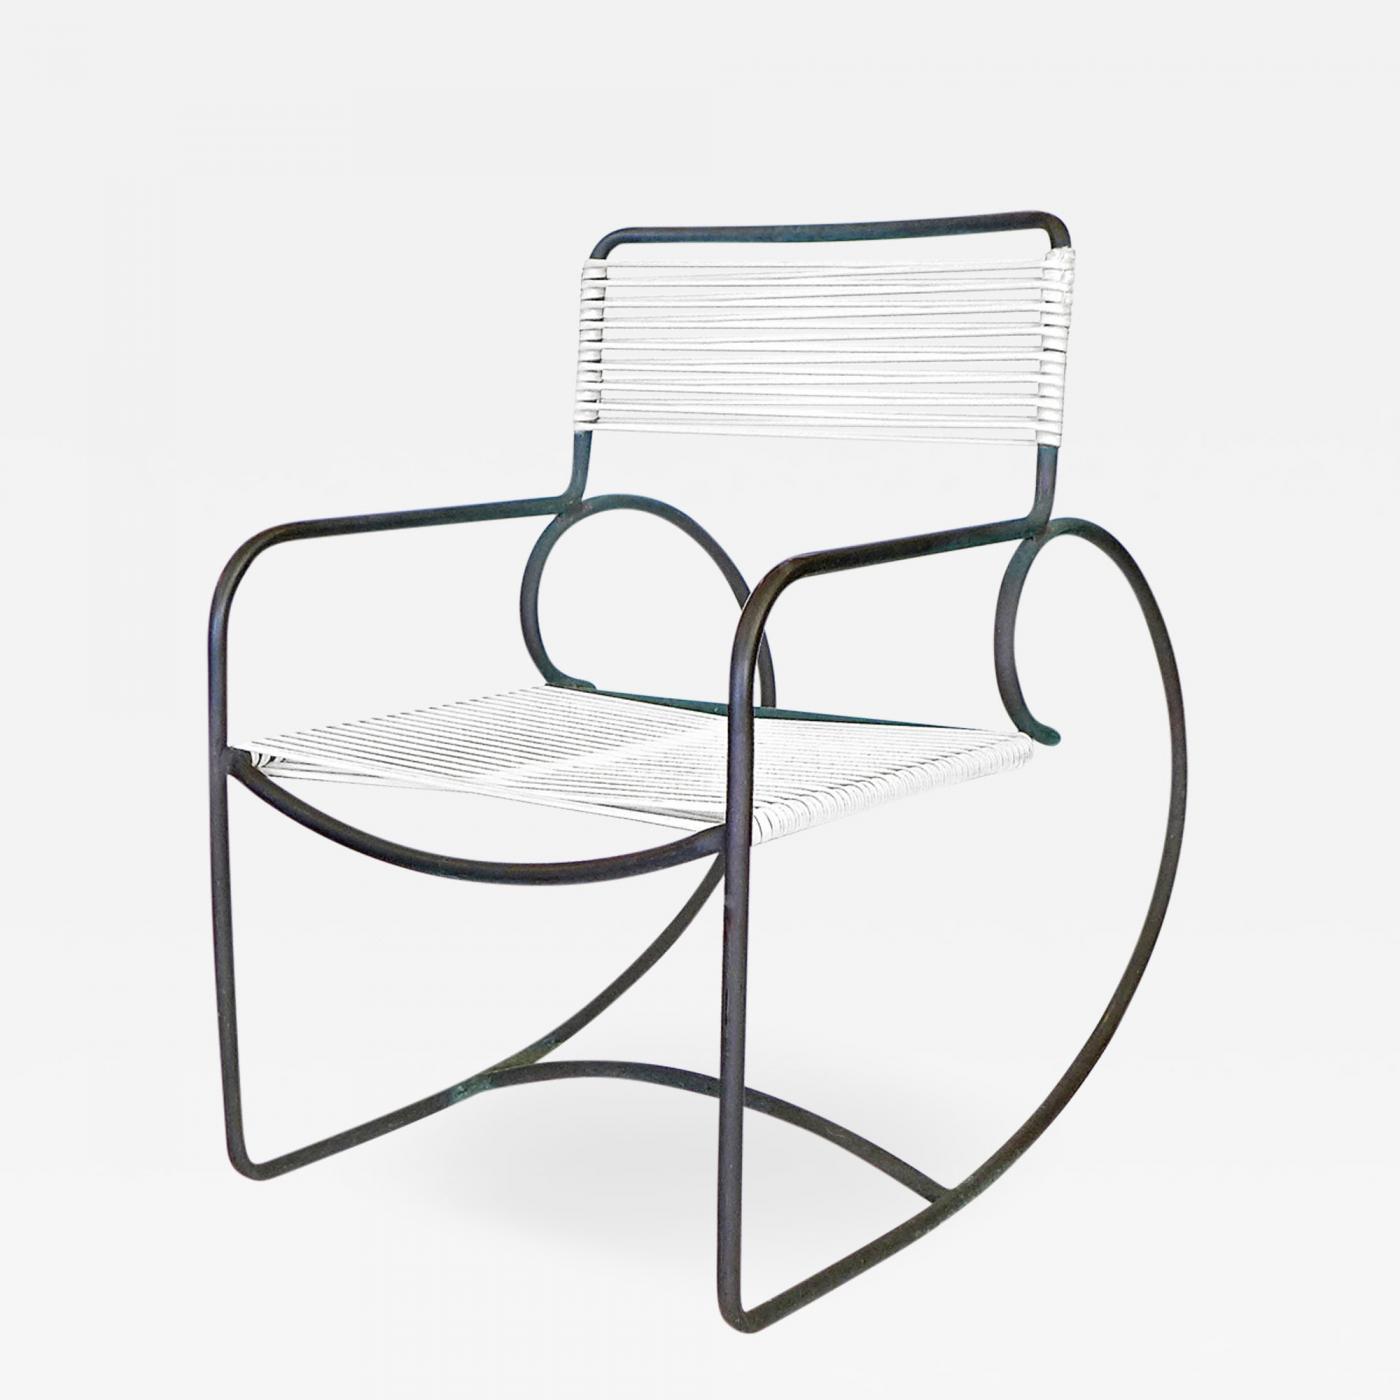 Pleasant Walter Lamb Pair Of Walter Lamb Bronze Rocking Chairs Inzonedesignstudio Interior Chair Design Inzonedesignstudiocom